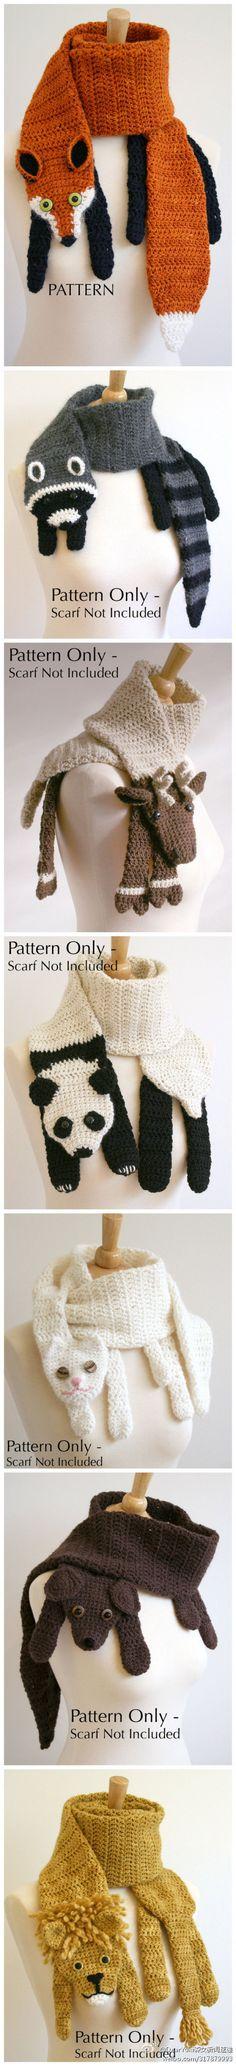 24 best Crochet Animals images on Pinterest | Crochet Animals ...